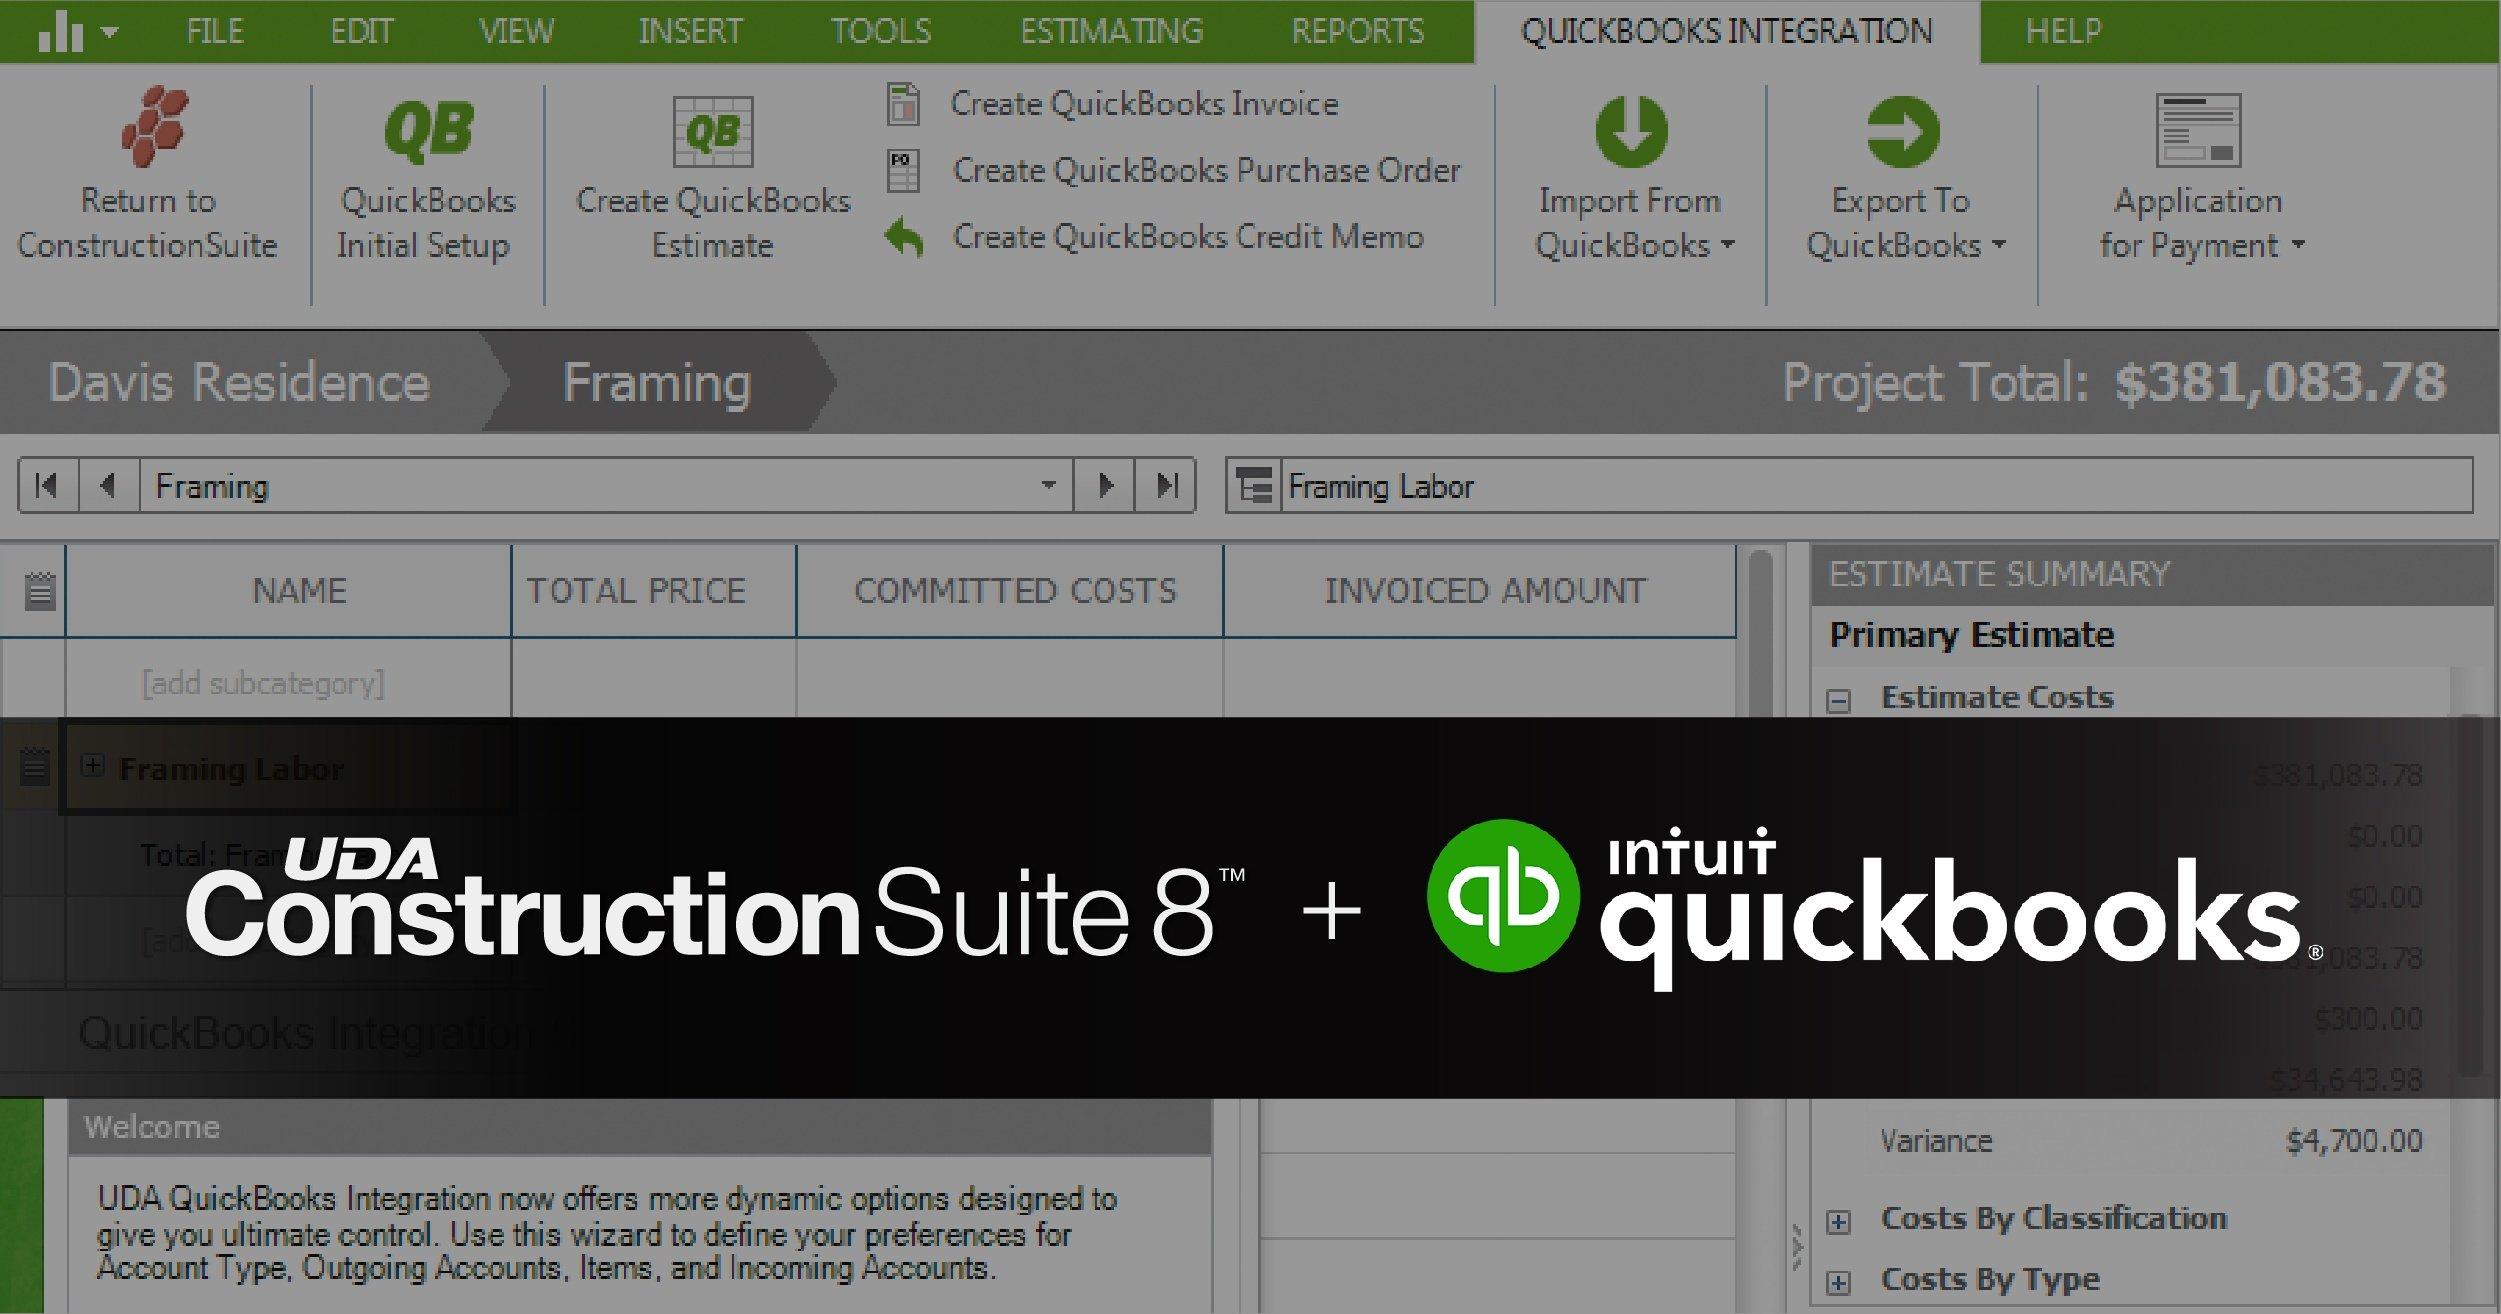 ConstructionSuite 8 + QuickBooks Integration: 2018 Compatibility Update